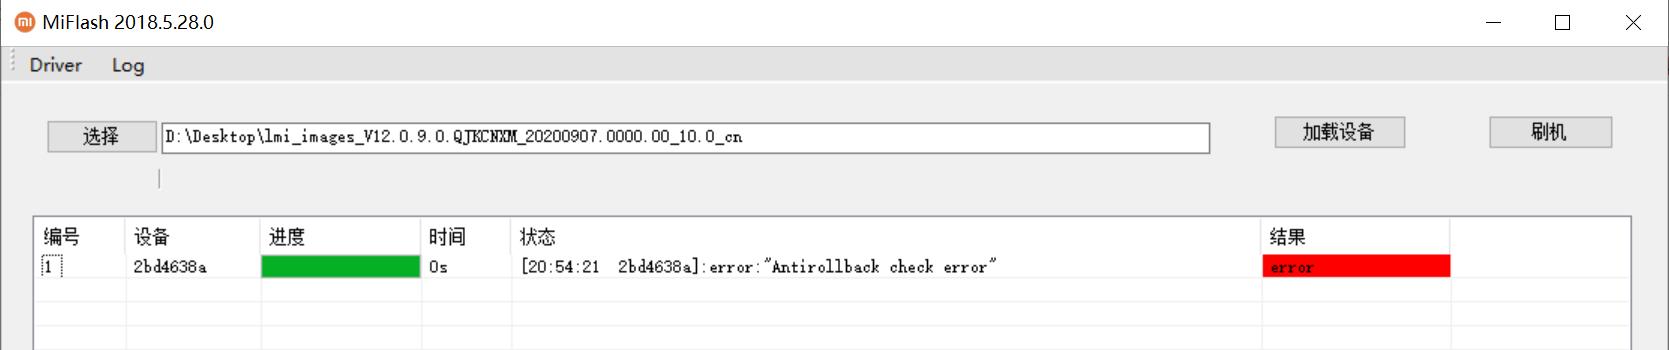 Antirollback check error